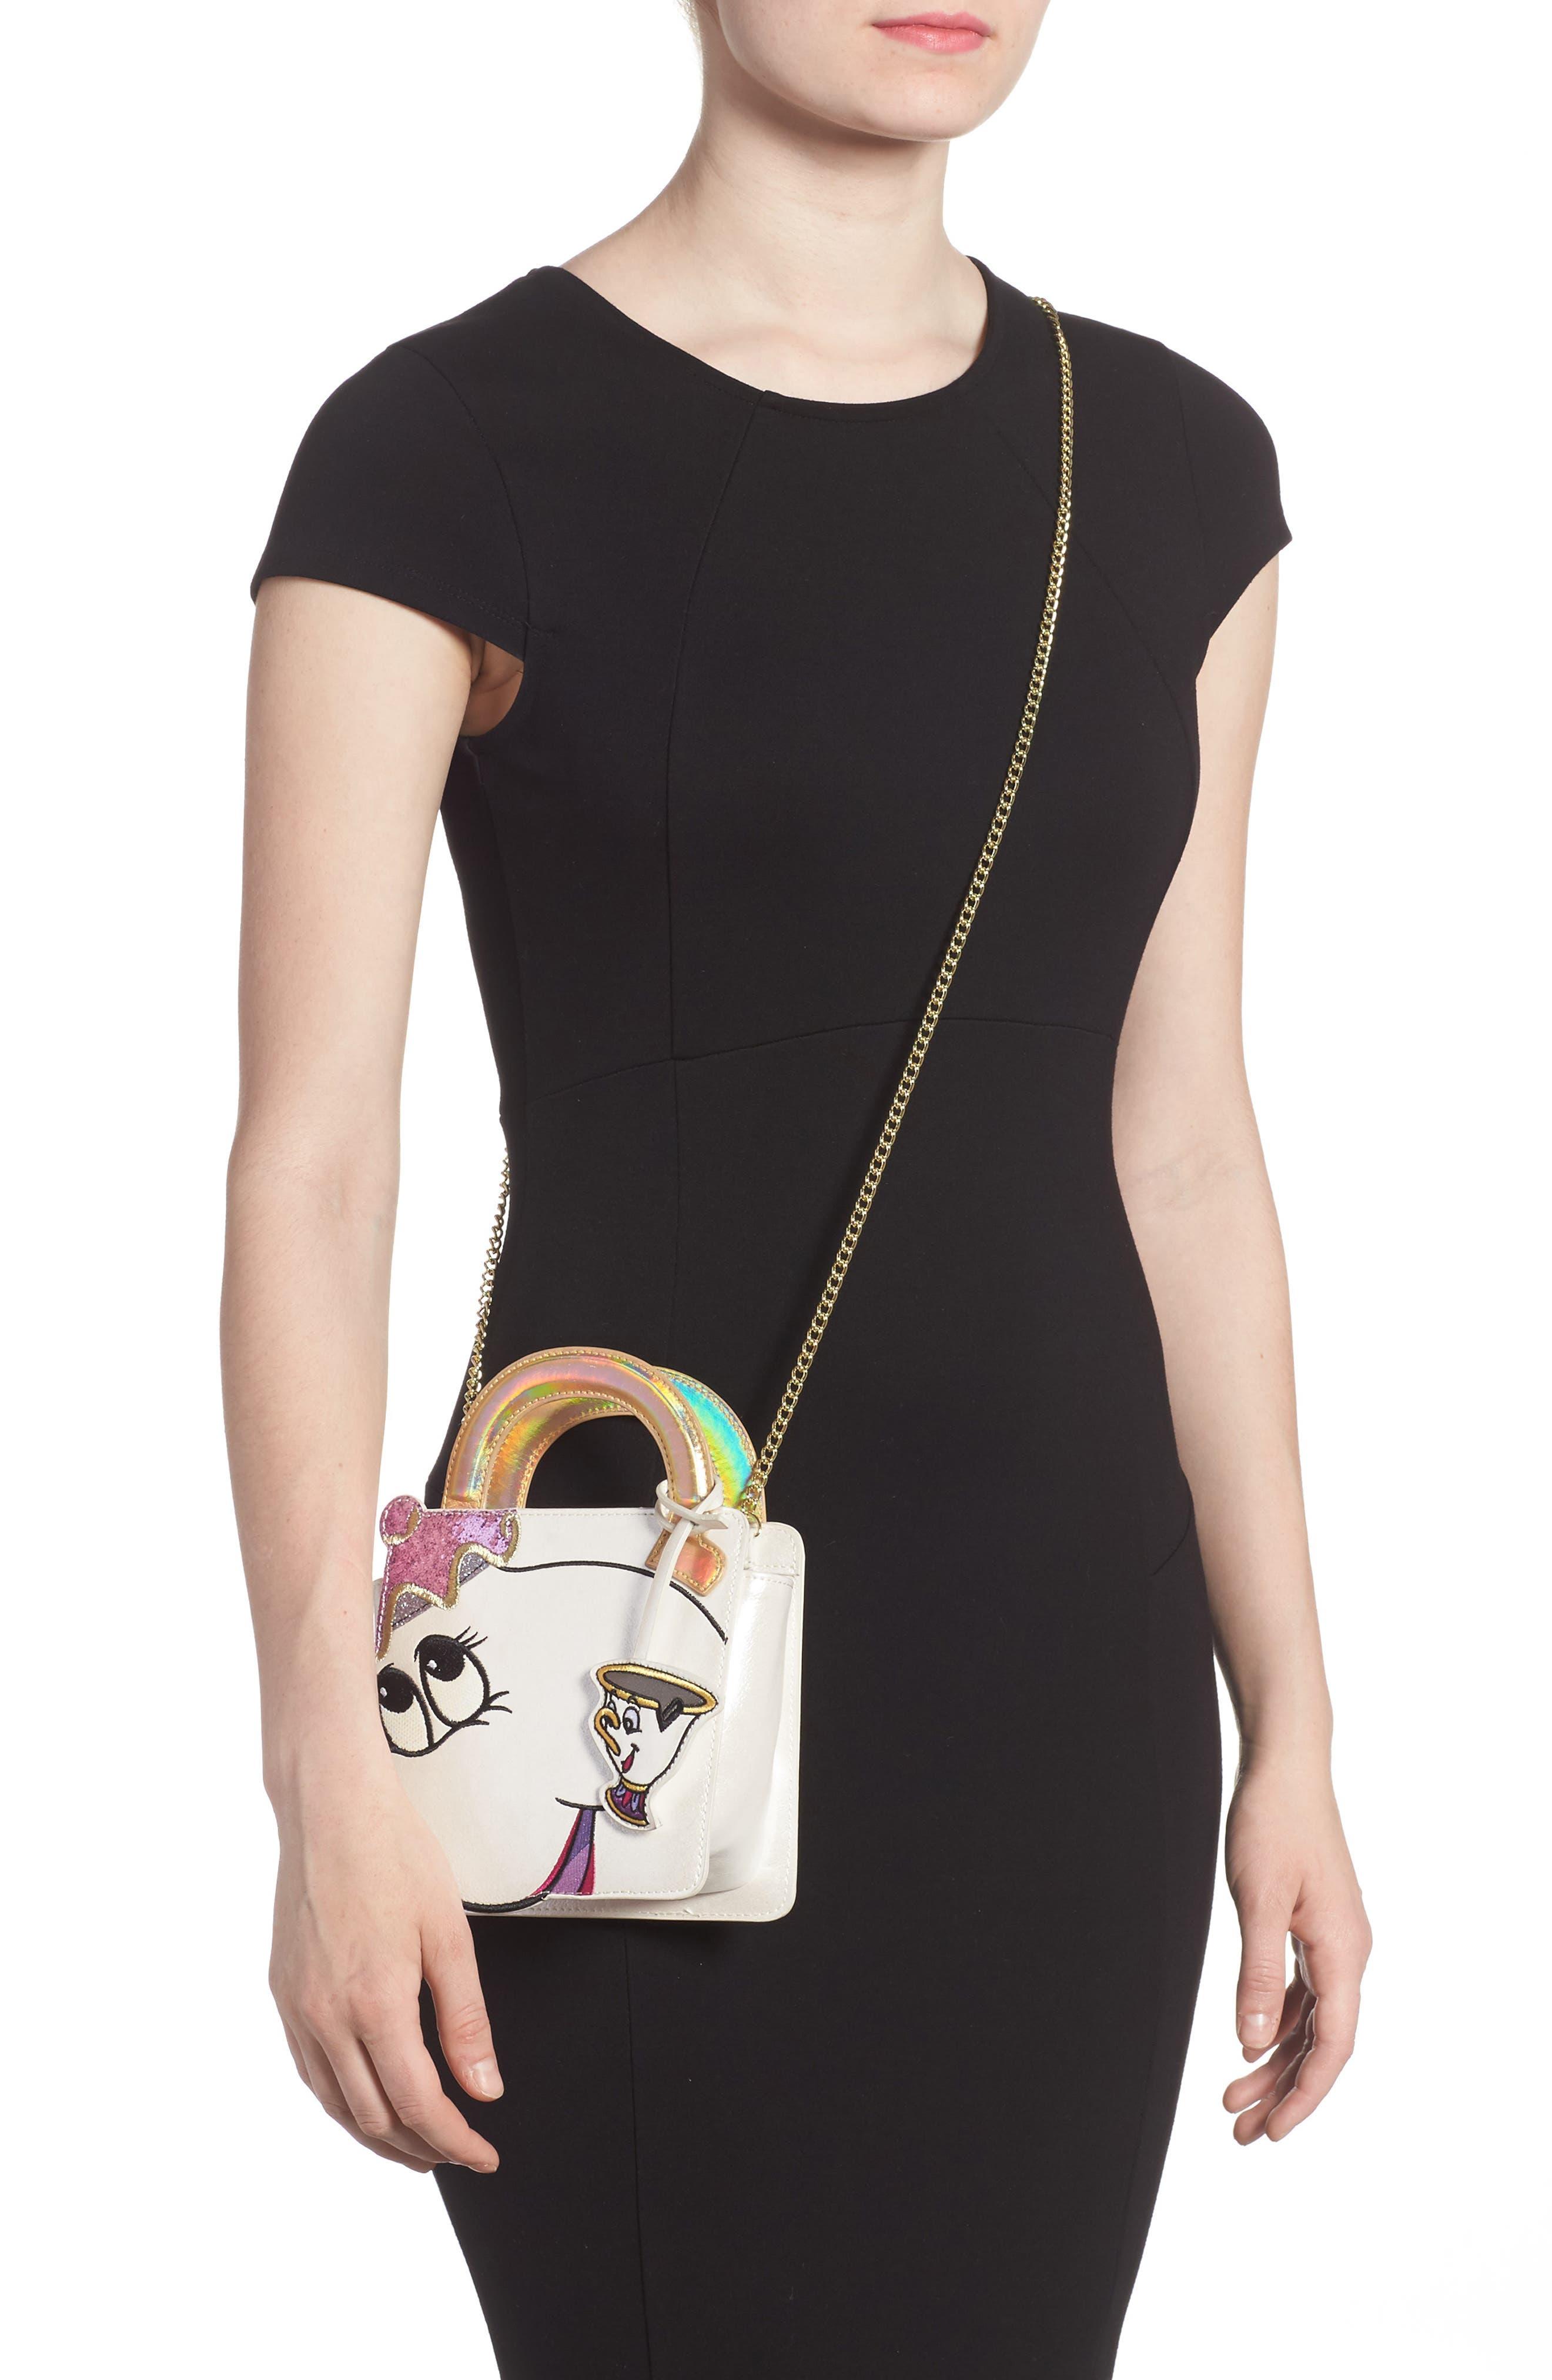 DANIELLE NICOLE,                             x Disney<sup>®</sup> Mrs. Potts & Chip Faux Leather Crossbody Bag,                             Alternate thumbnail 2, color,                             040